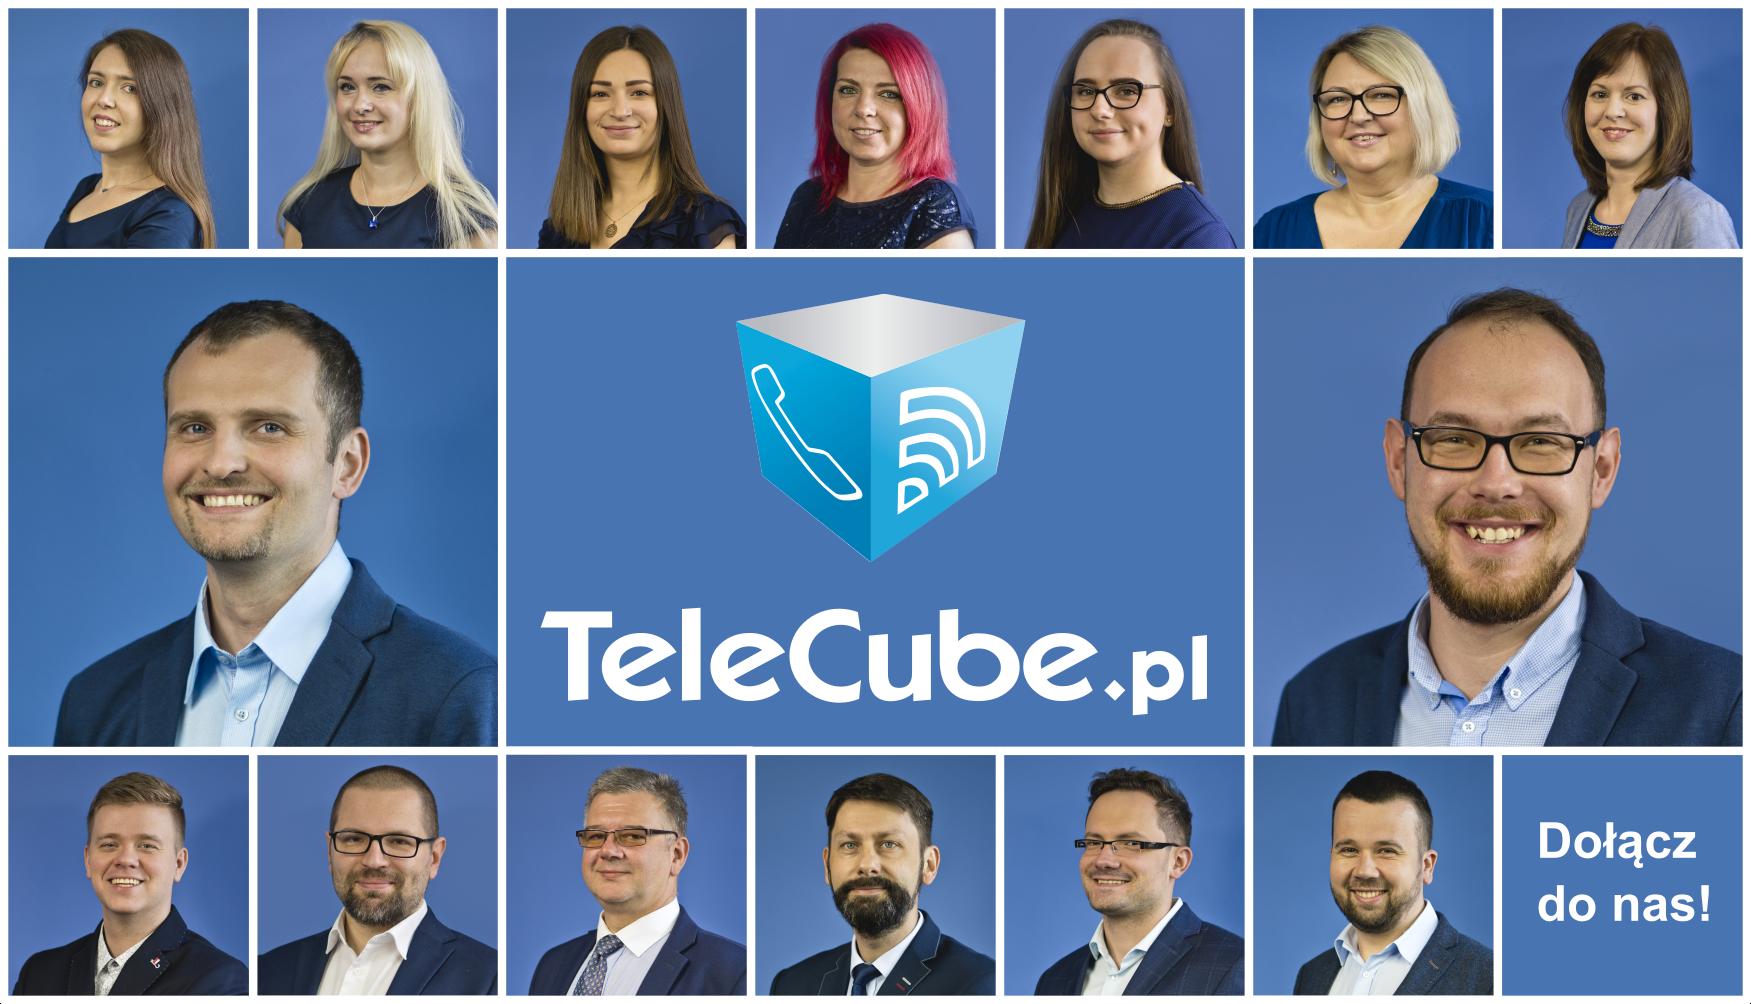 Pracownicy TeleCube